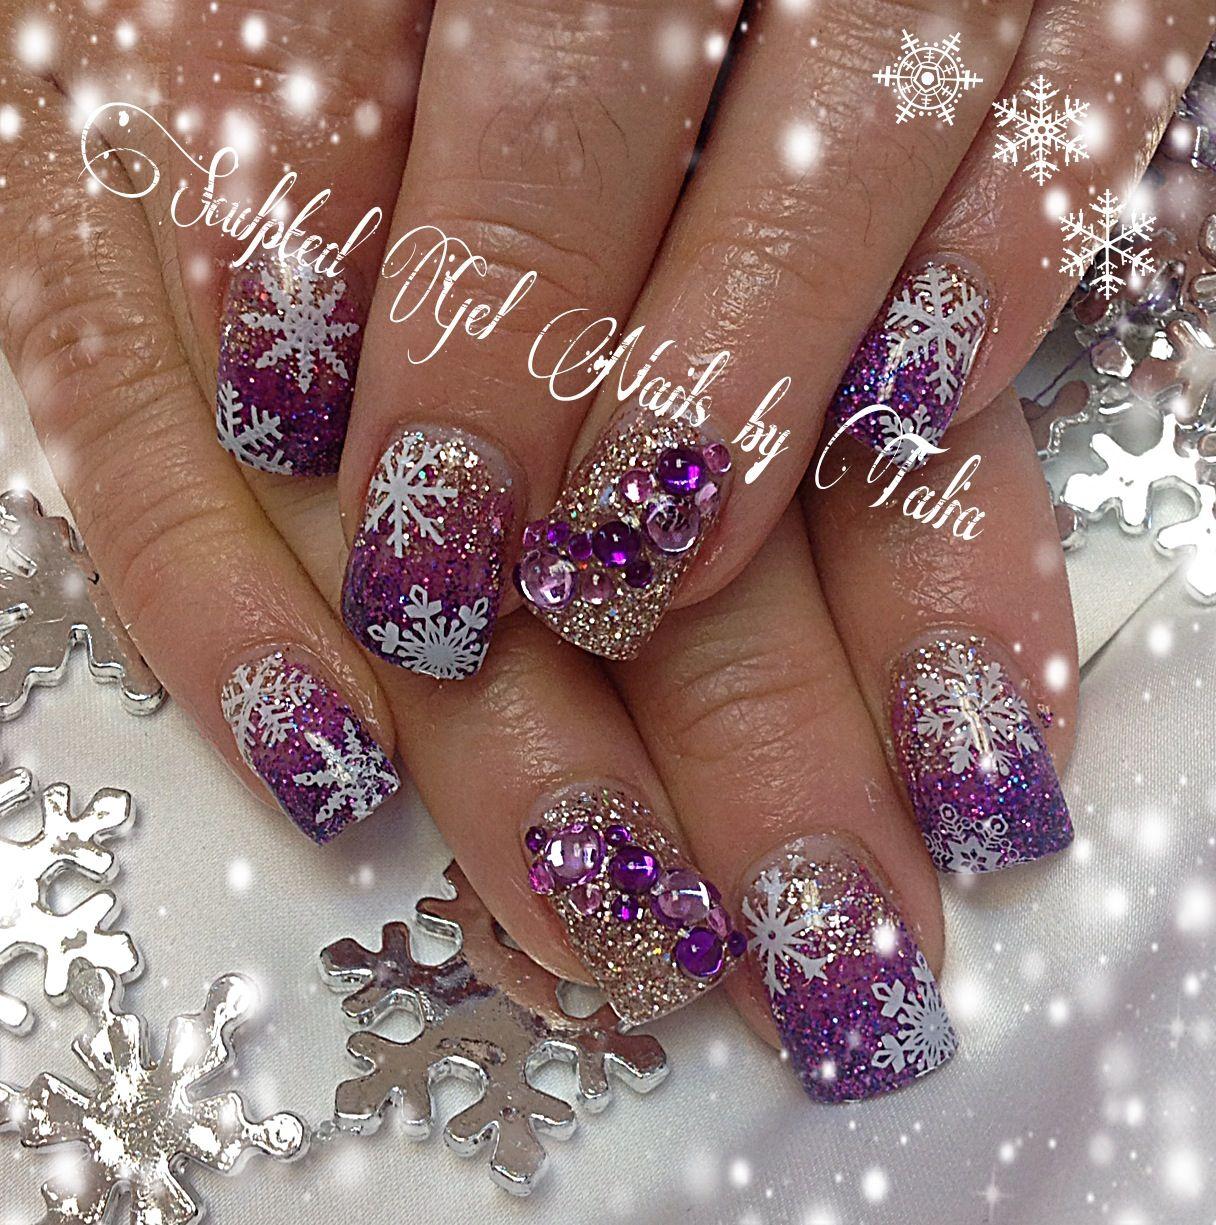 Purple winter Christmas snowflake nailsthe jewels might